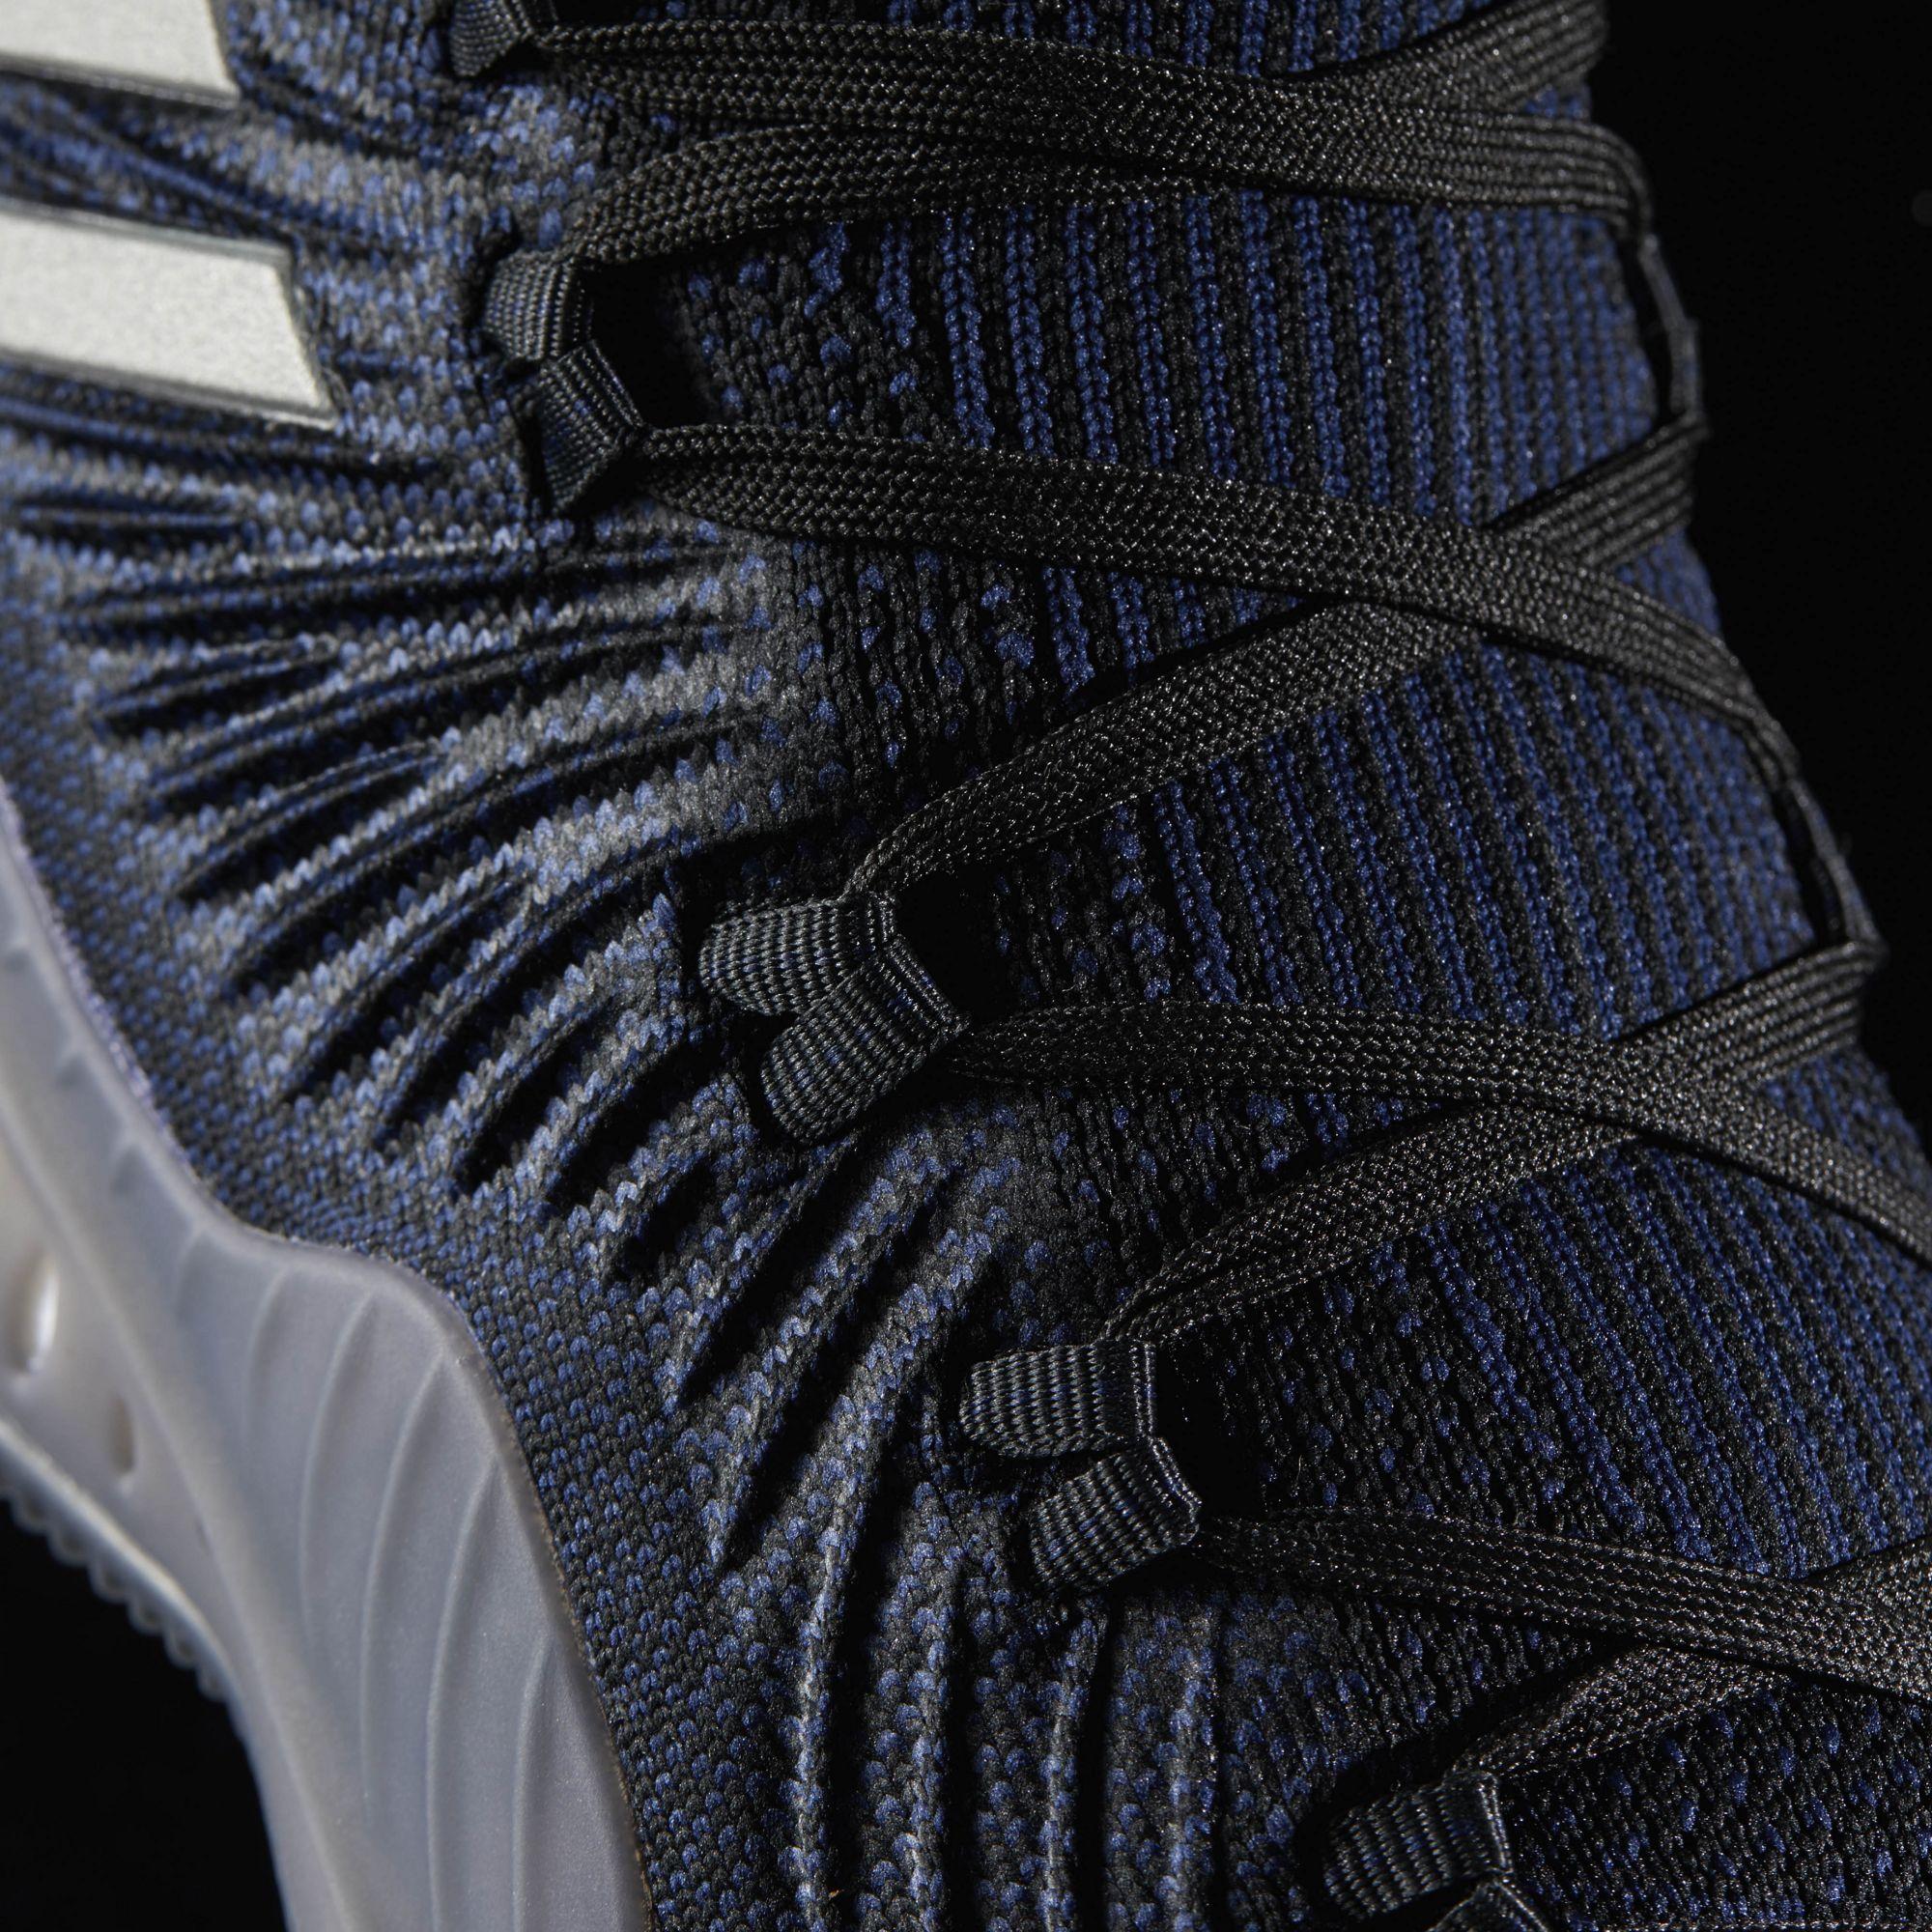 adidas crazy explosive 2017 primeknit andrew wiggins pe black 8